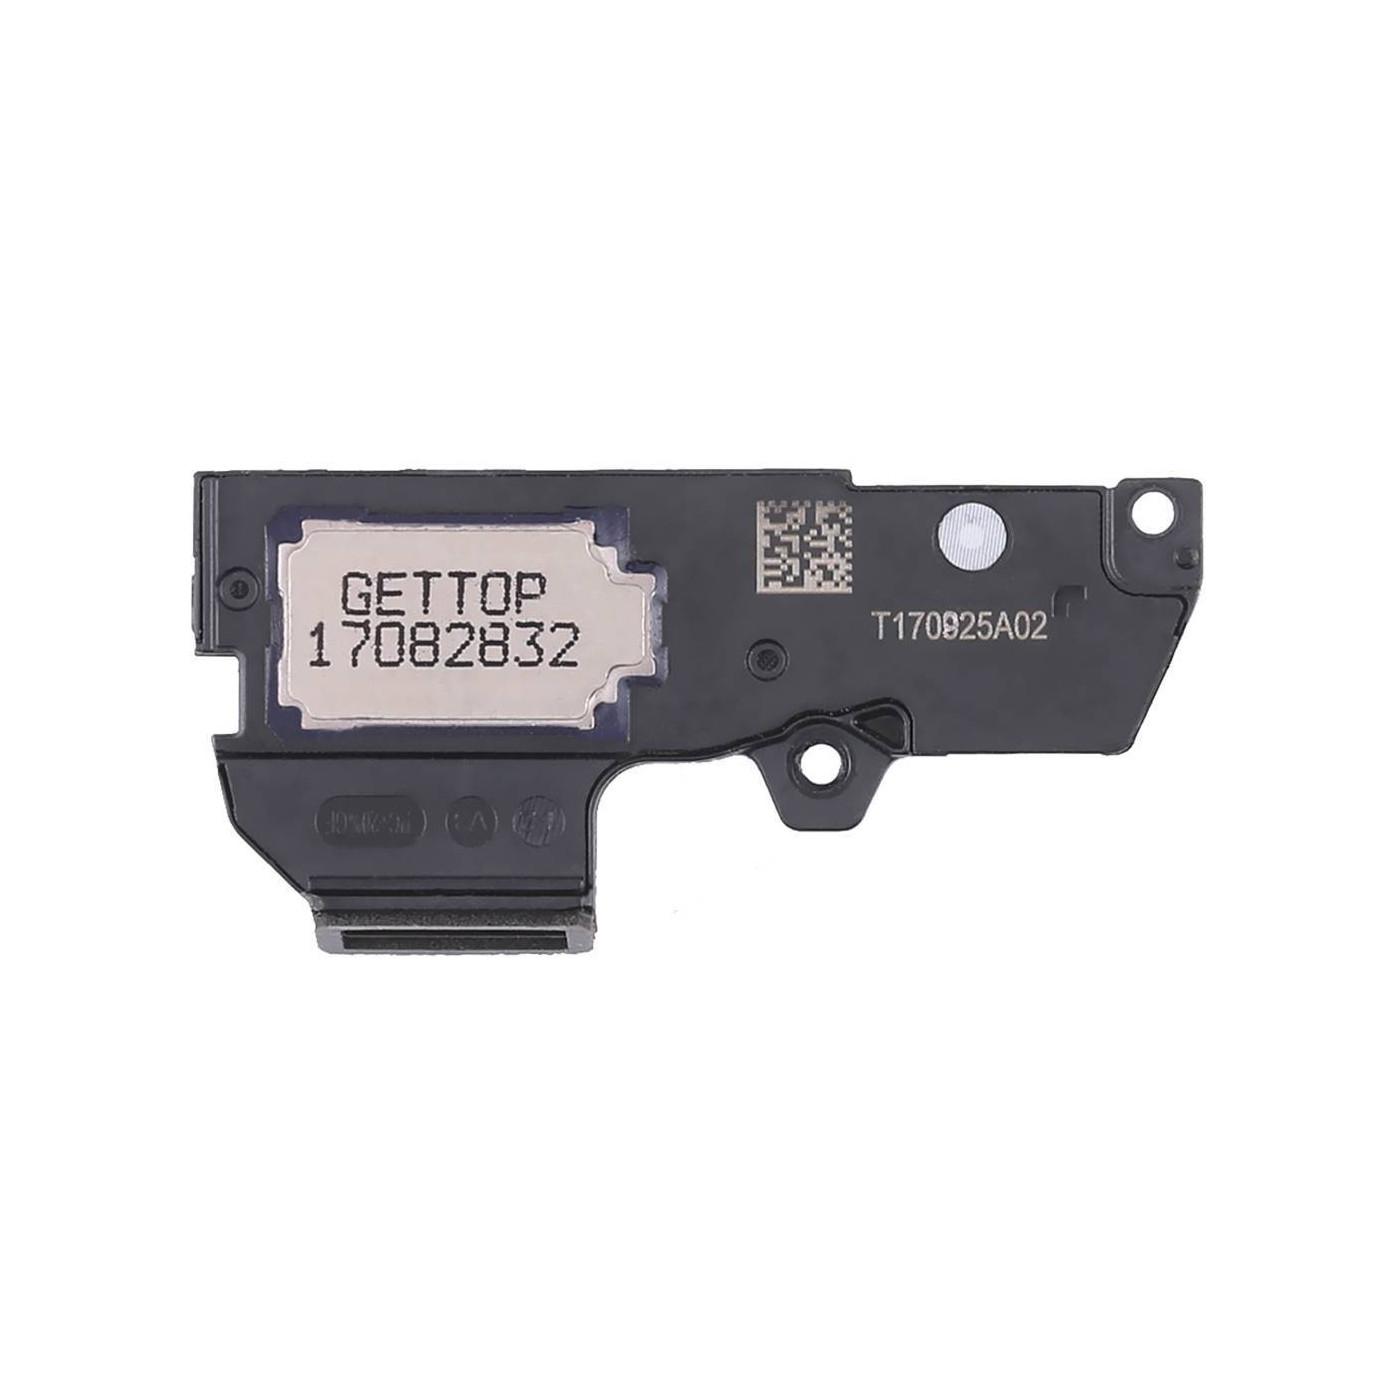 Lauter Lautsprecher Summer Huawei Mate-Lite 10 Klingel weniger Lautsprecherbox